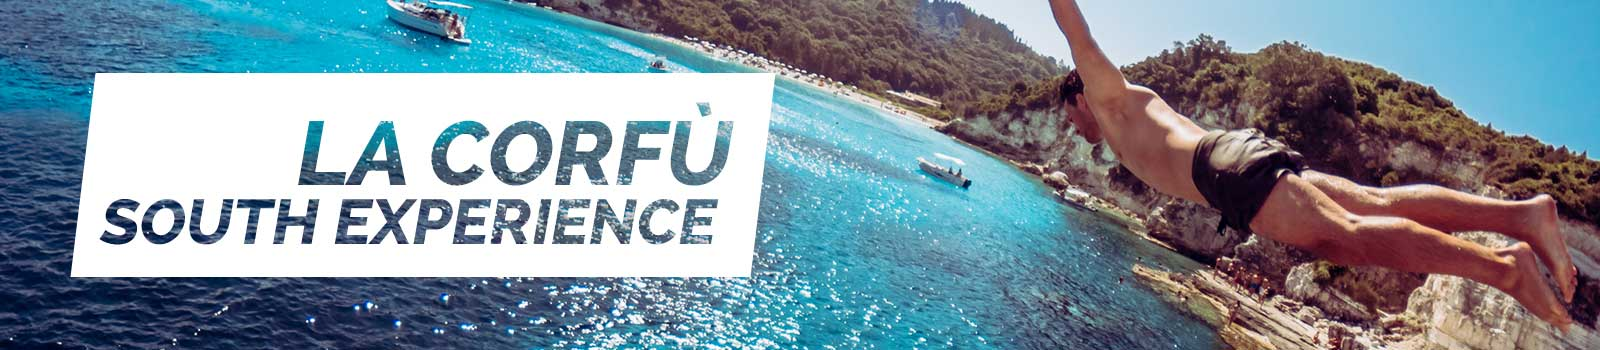 corfu-b1-south-experience